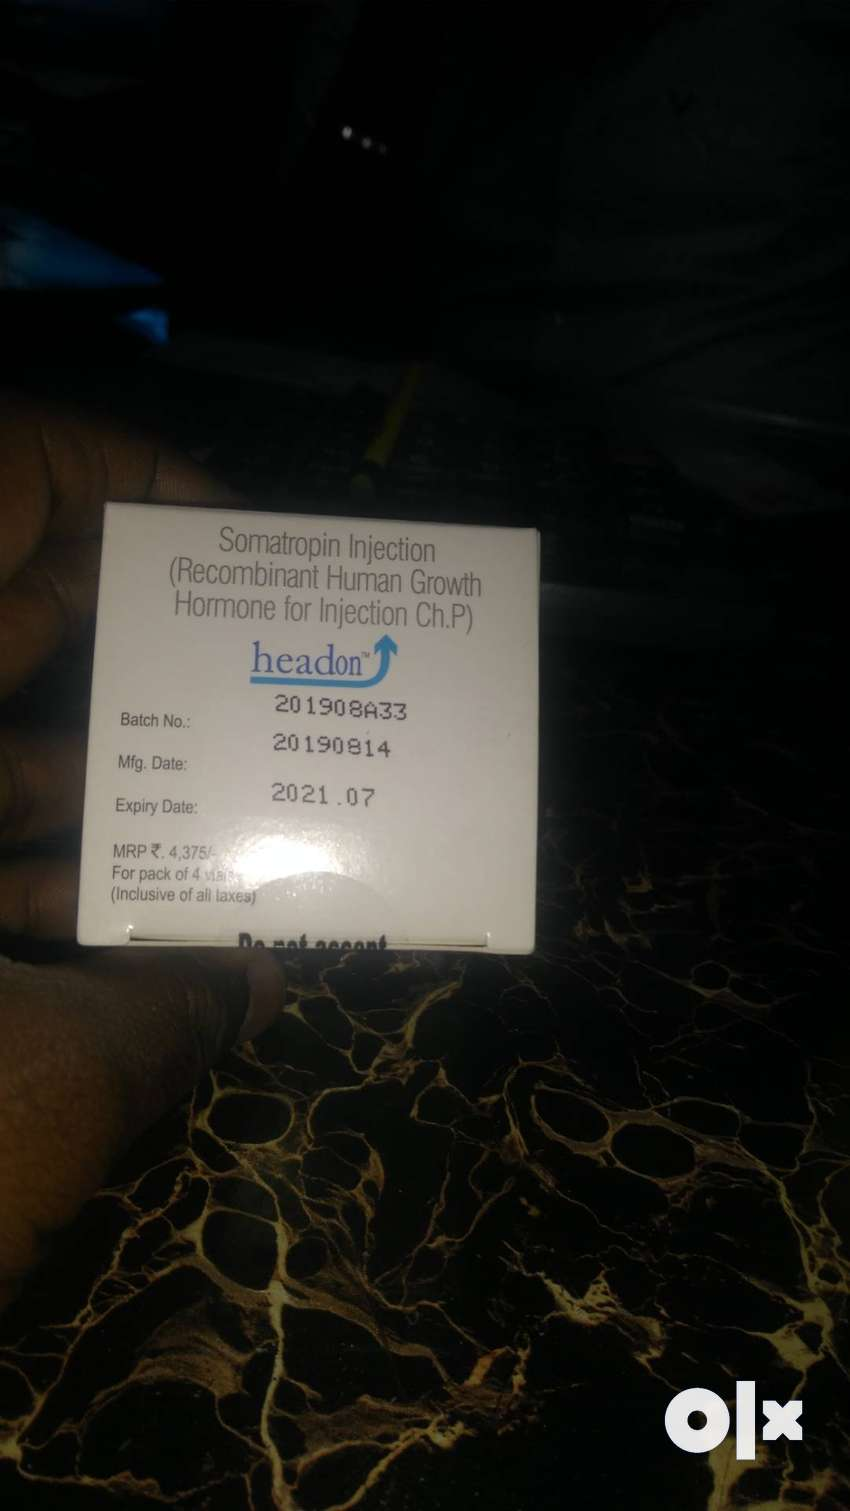 HGH GROWTH HORMONE SOMATROPIN 0